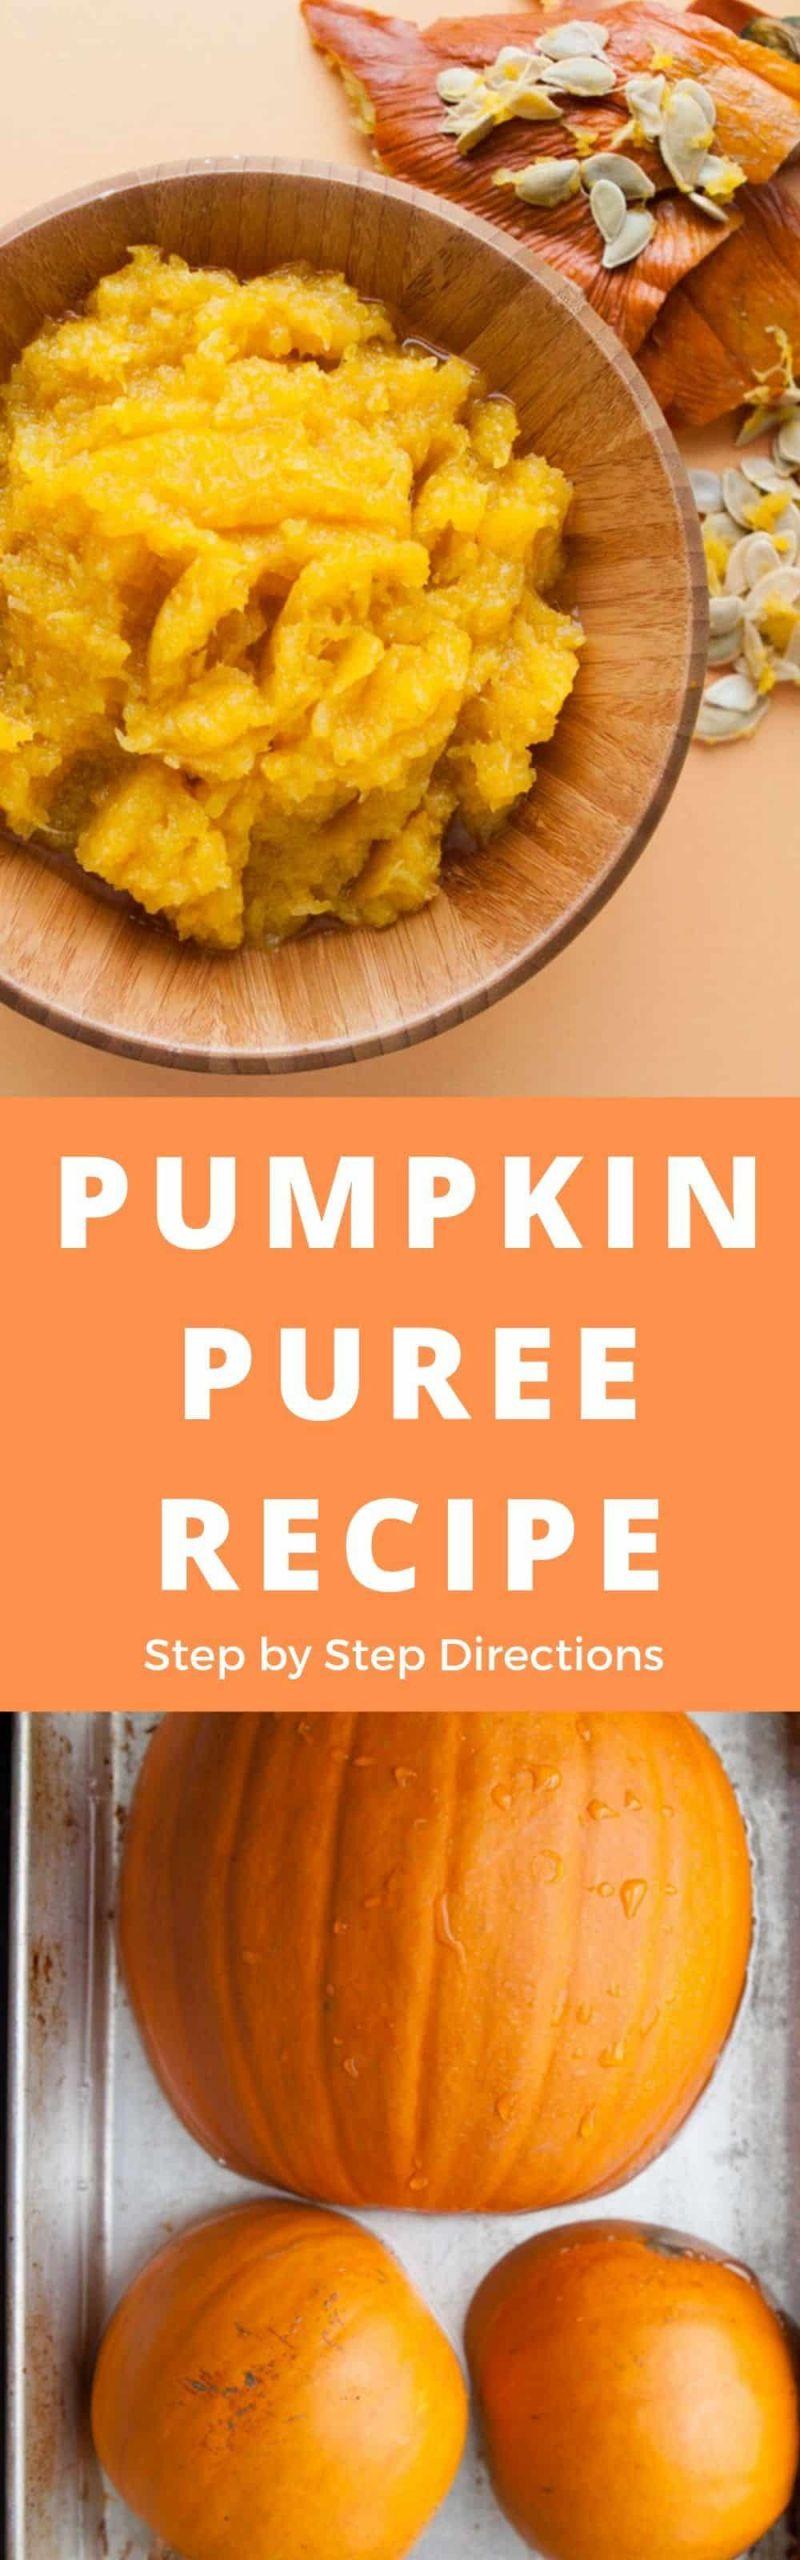 Pumpkin Puree Recipes Healthy  Pumpkin Puree Recipe How to Make Pumpkin Puree